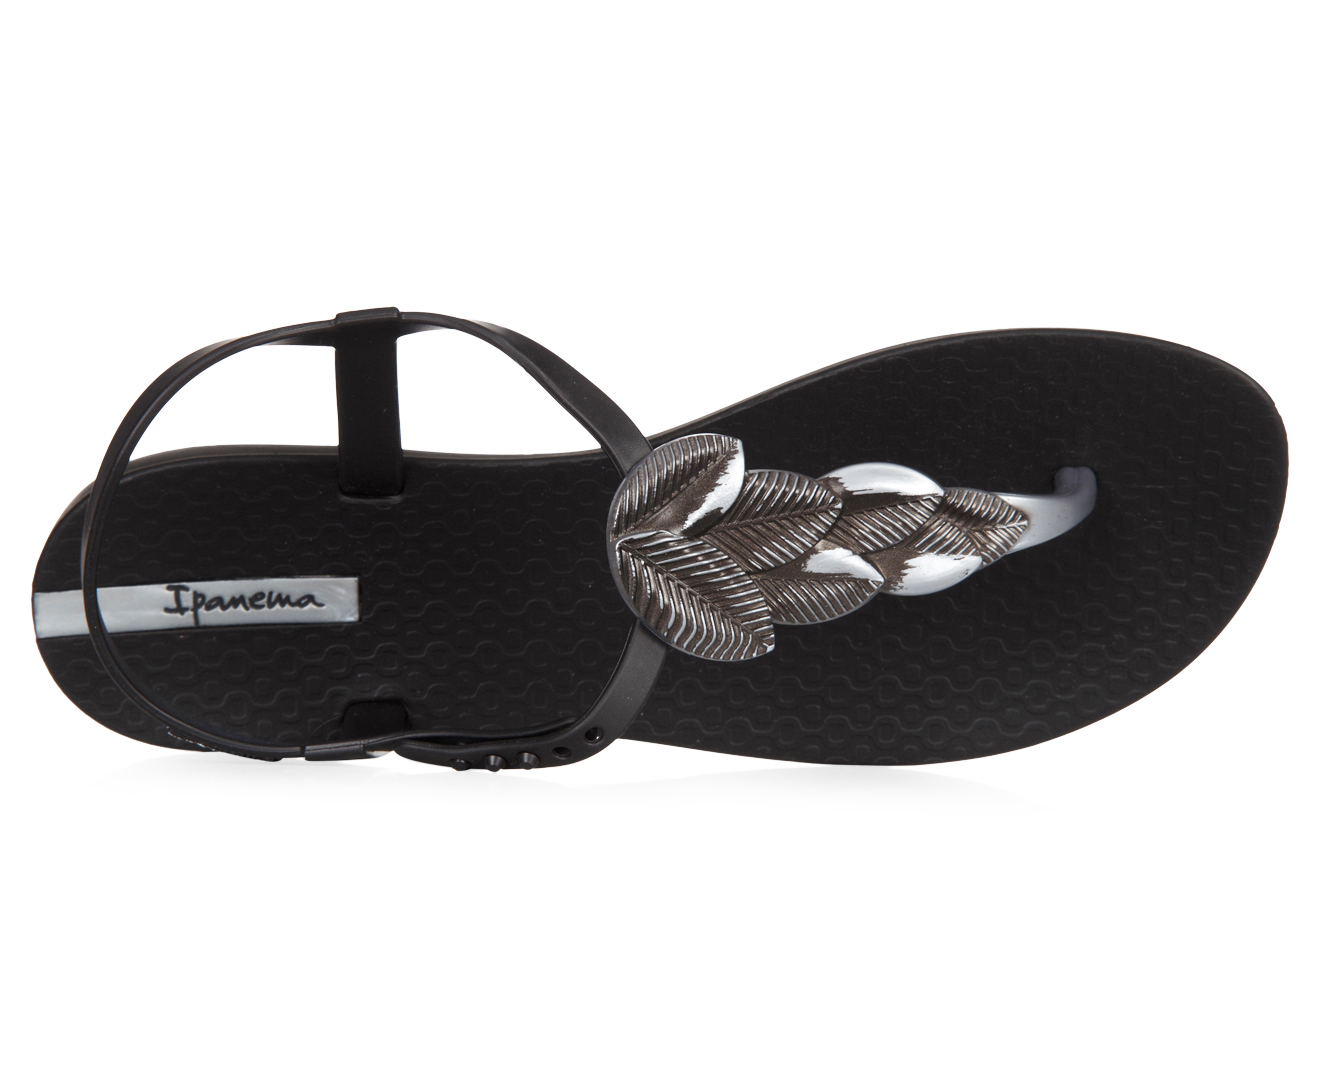 Cloverleaf Home Interiors Ipanema Sandals Australia 28 Images Ipanema Sandals